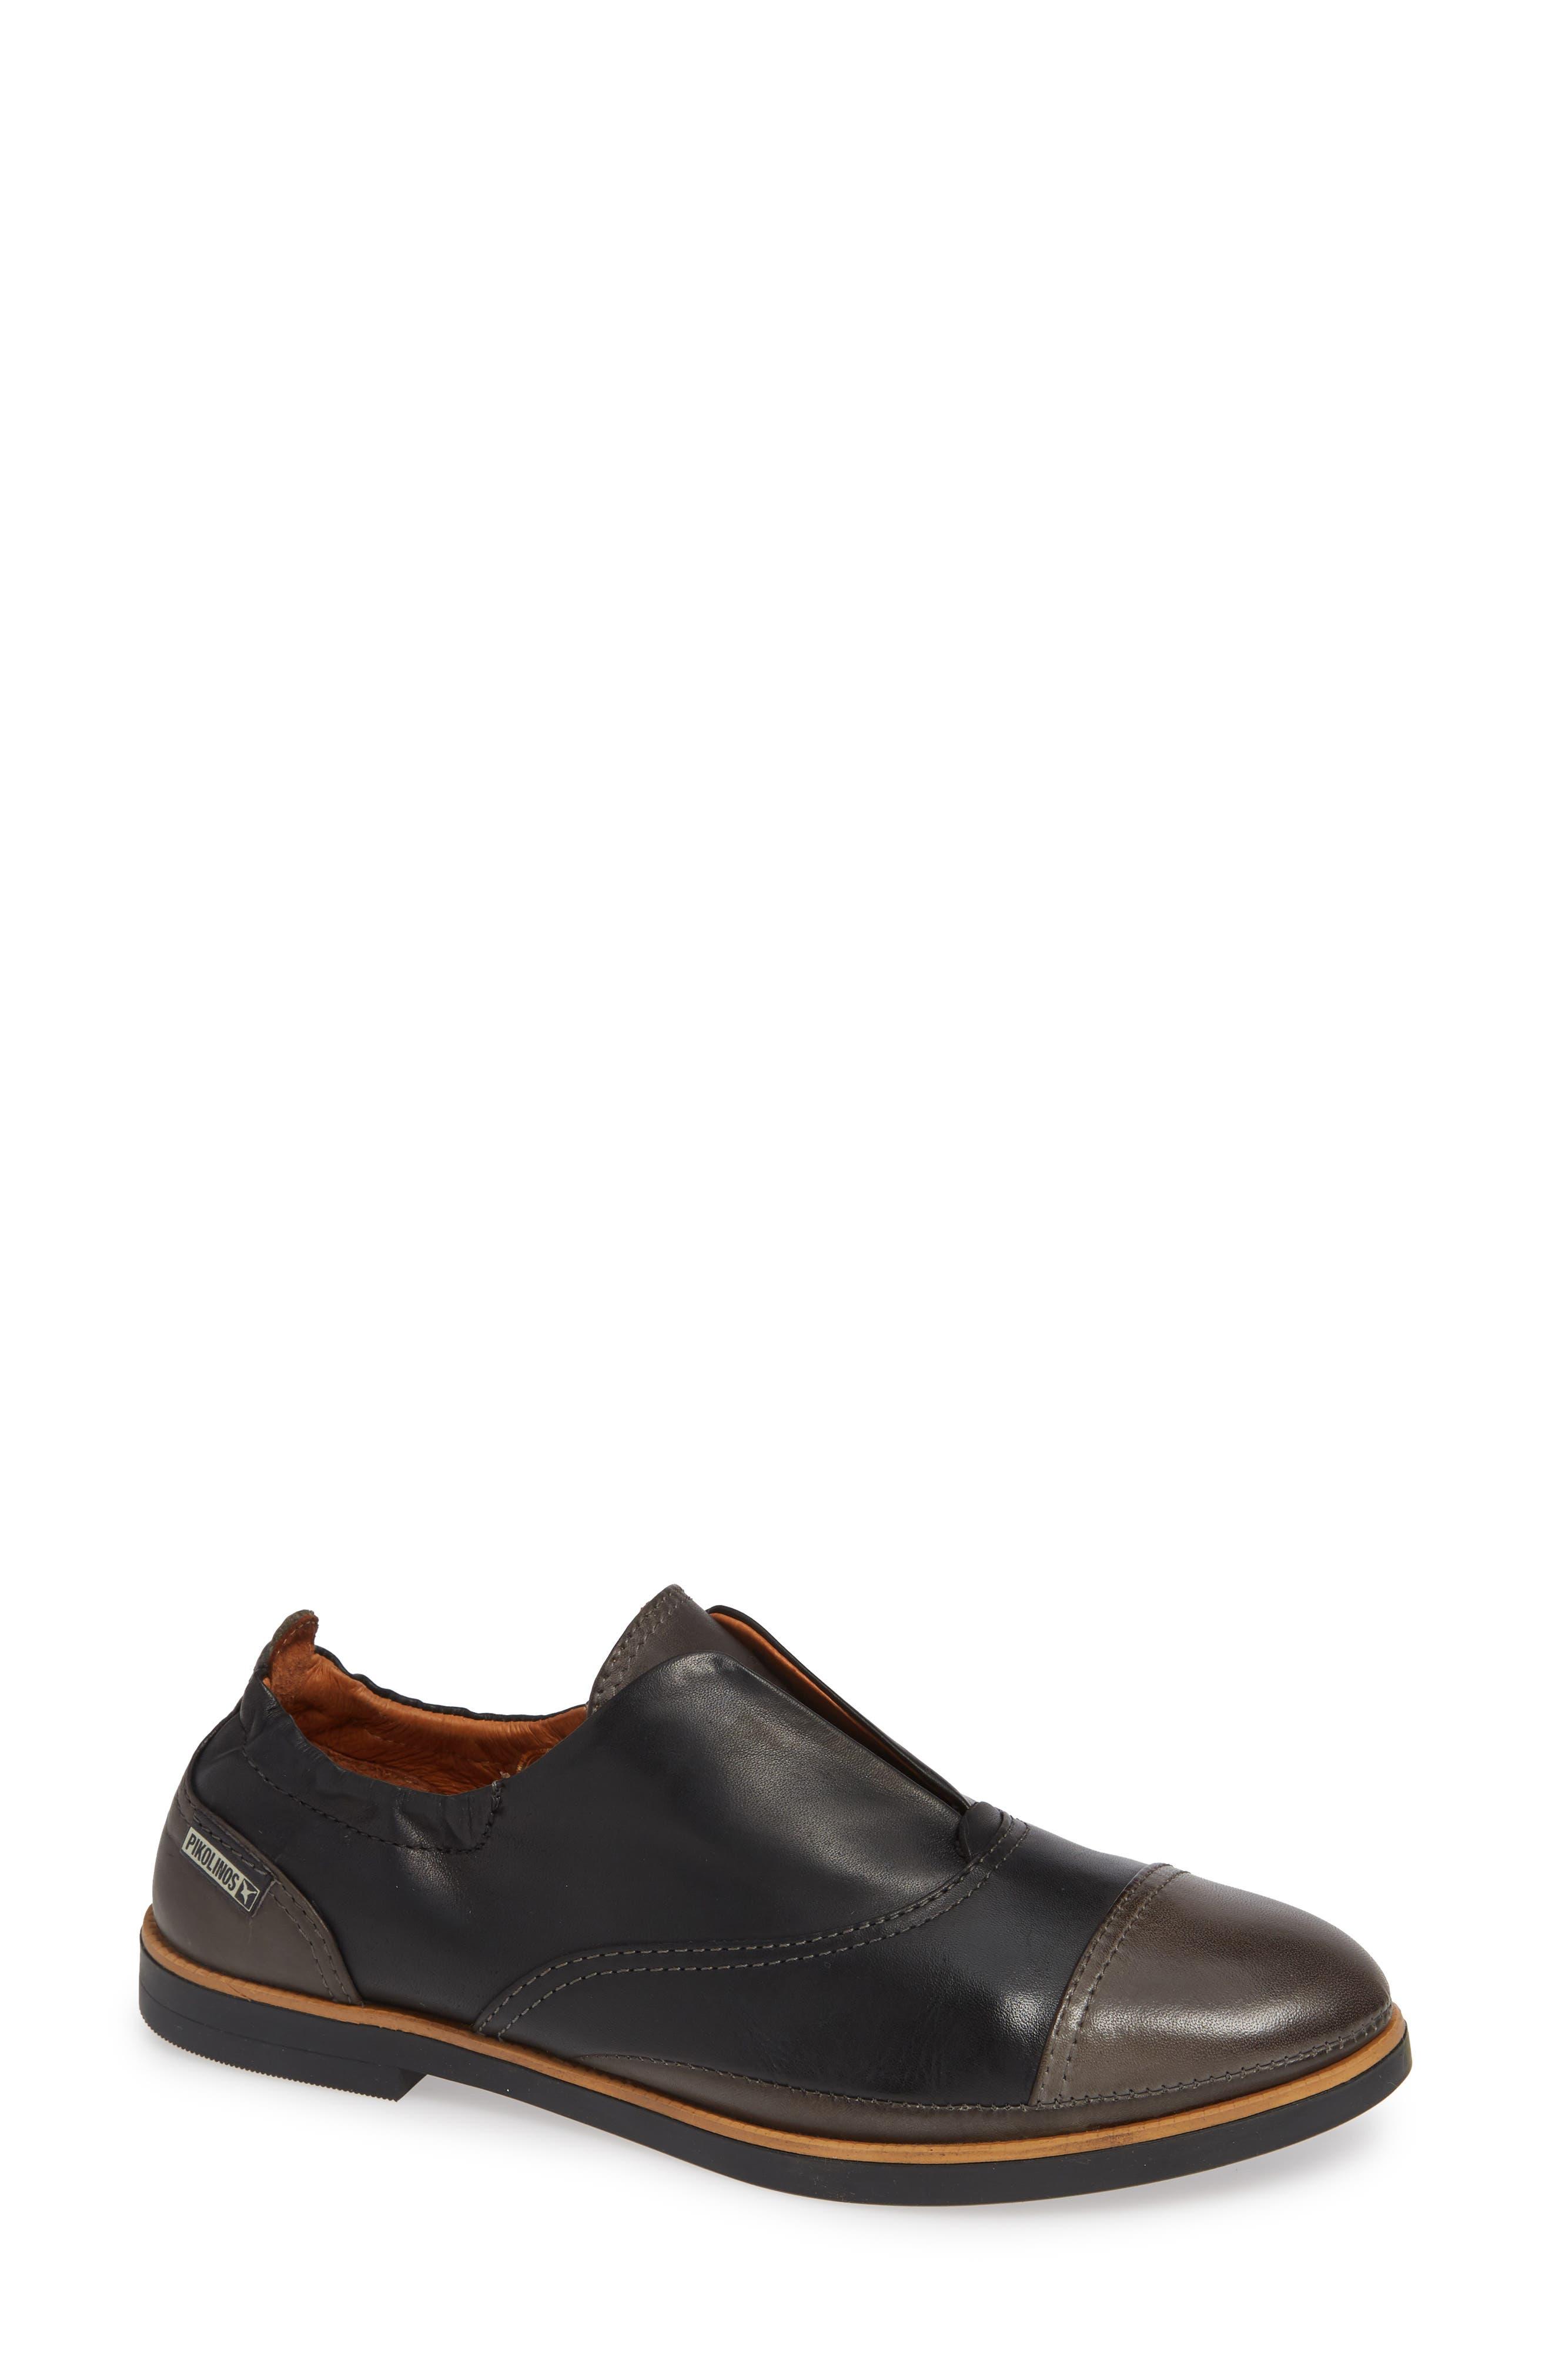 Pikolinos Santorini Colorblock Laceless Oxford, Black